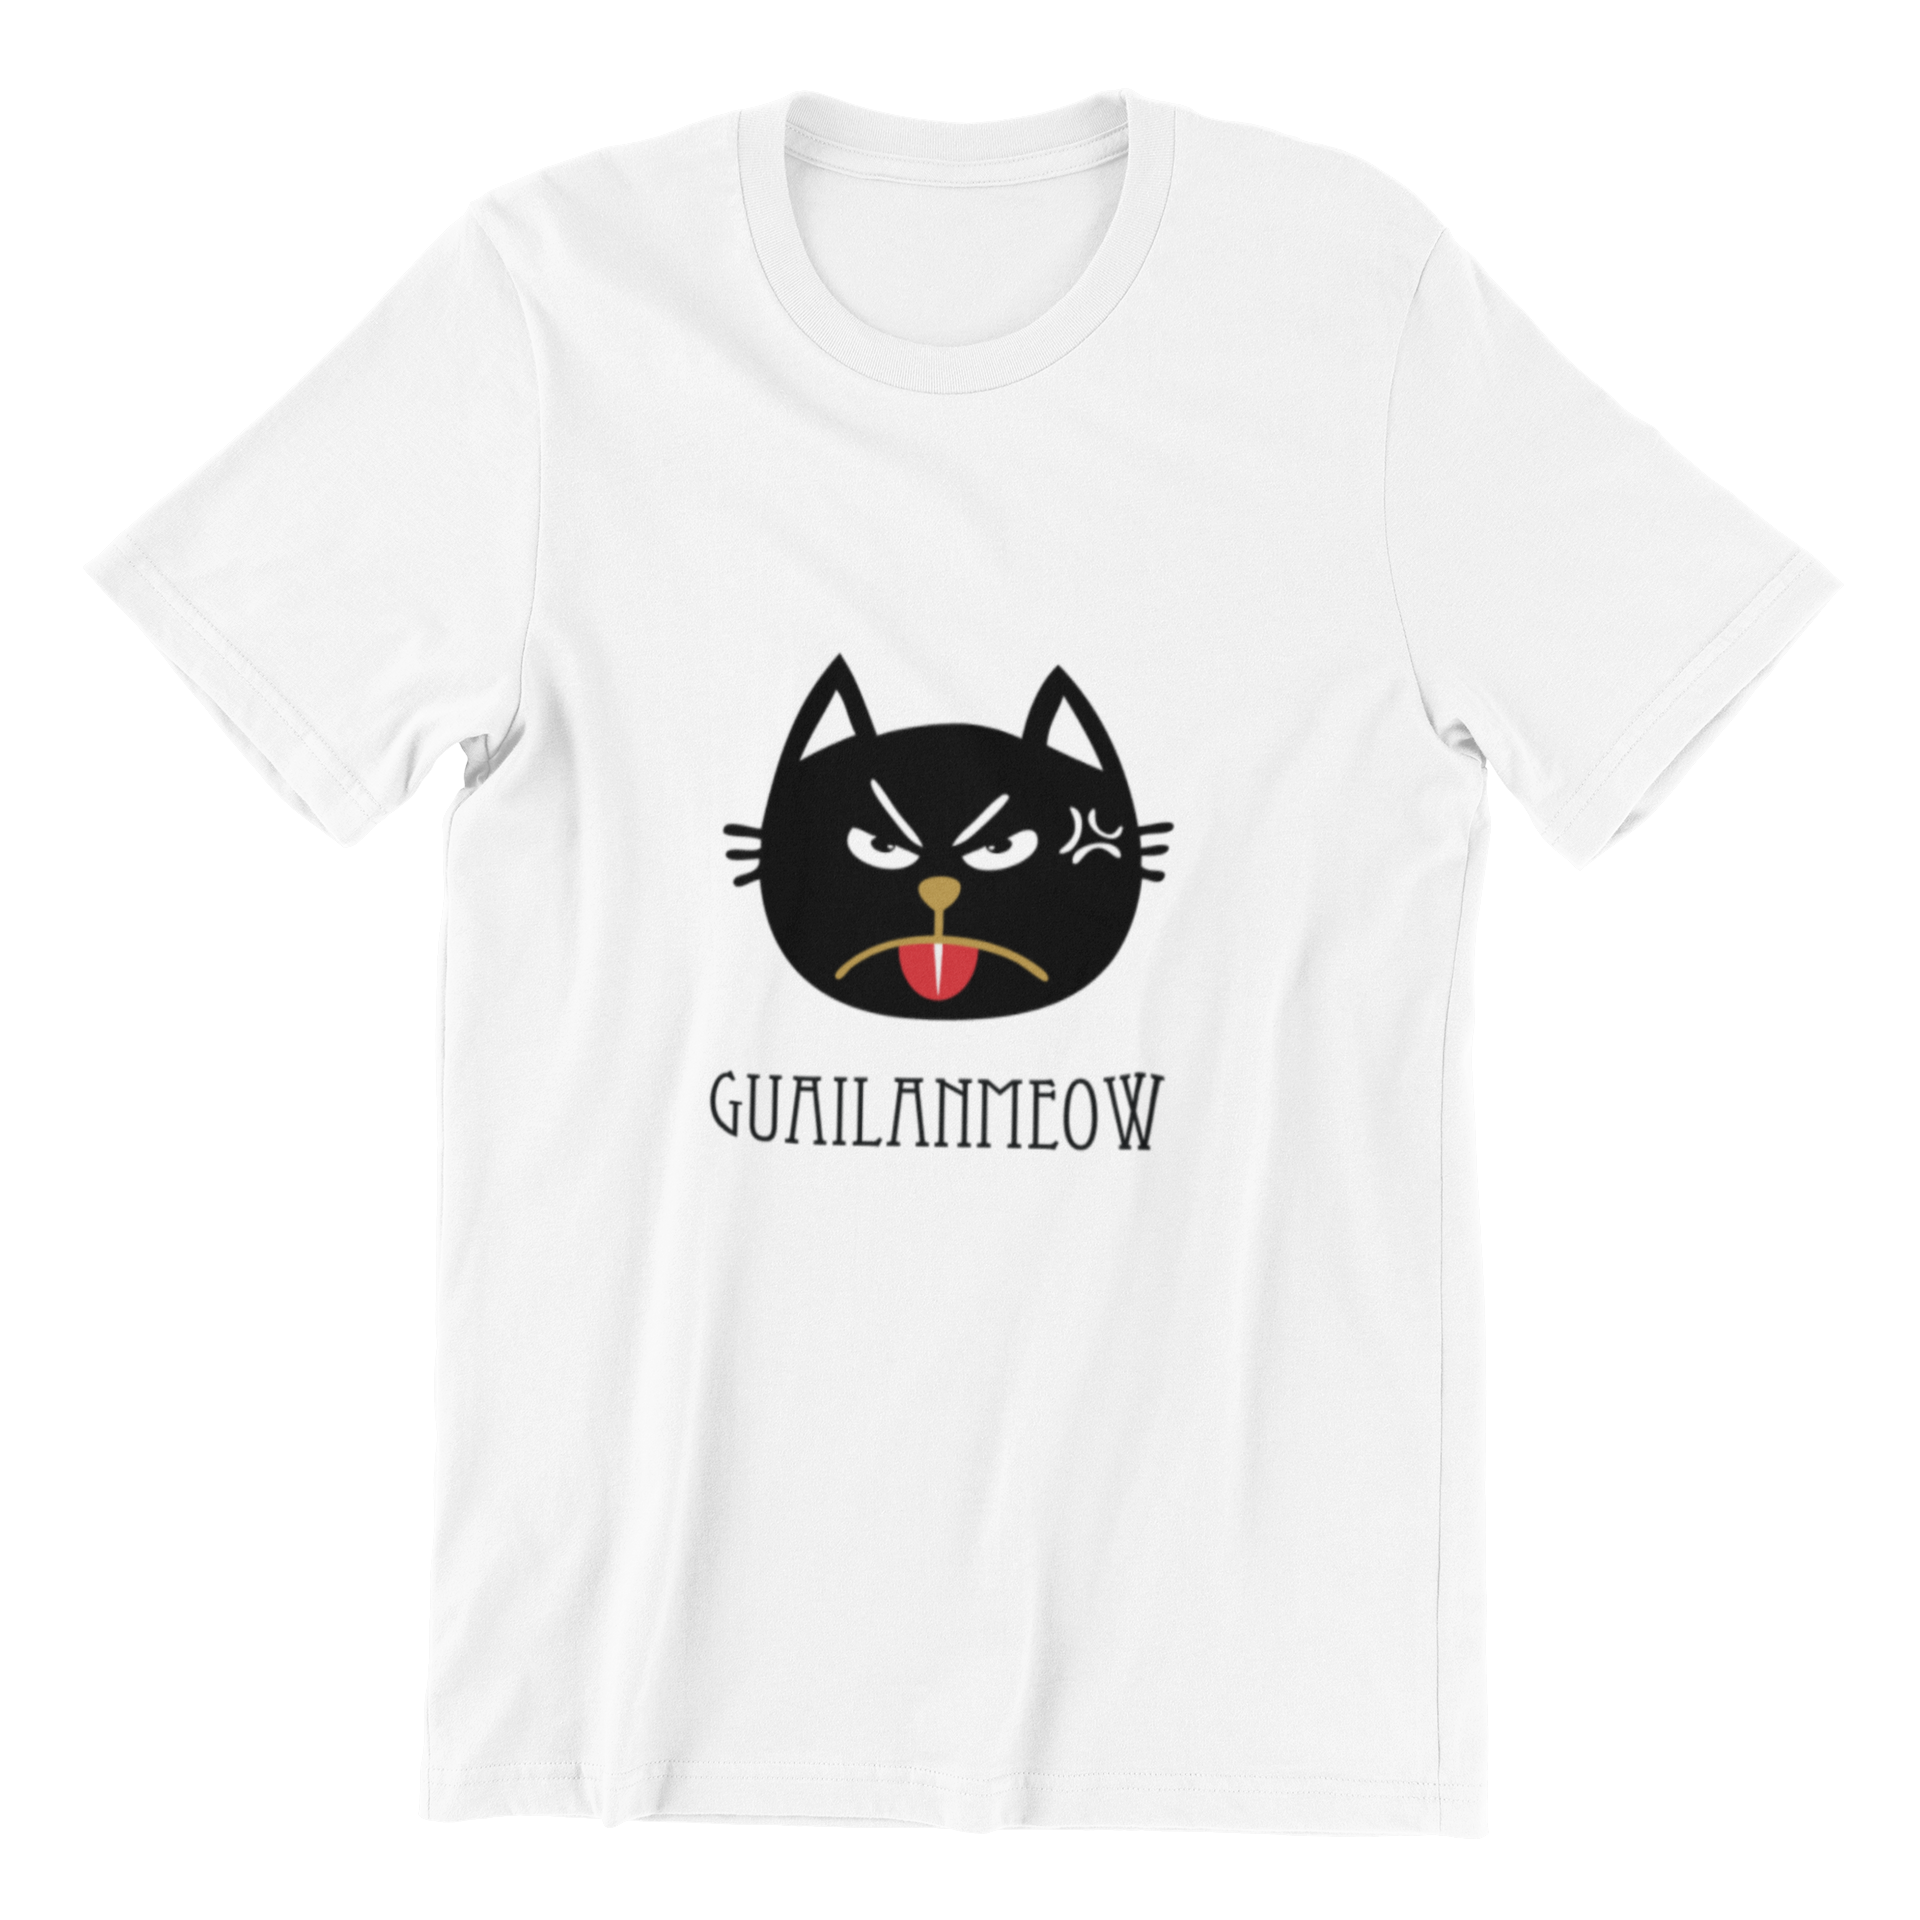 Guailanmeow Crew Neck S-Sleeve T-shirt